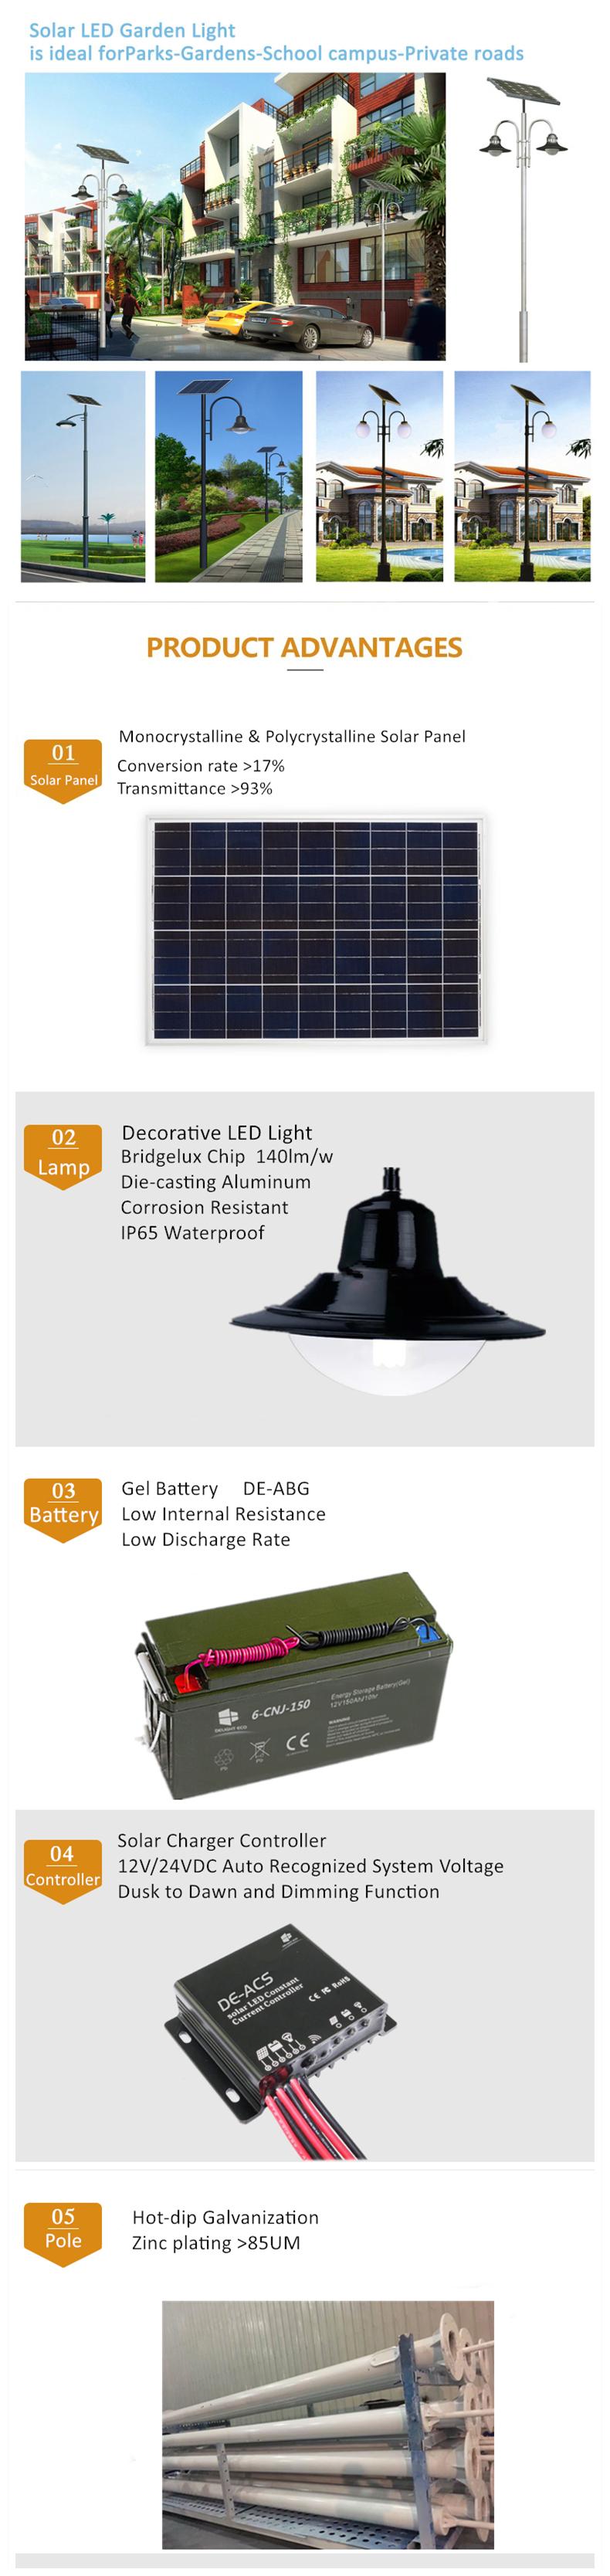 solar garden light DELIGHT